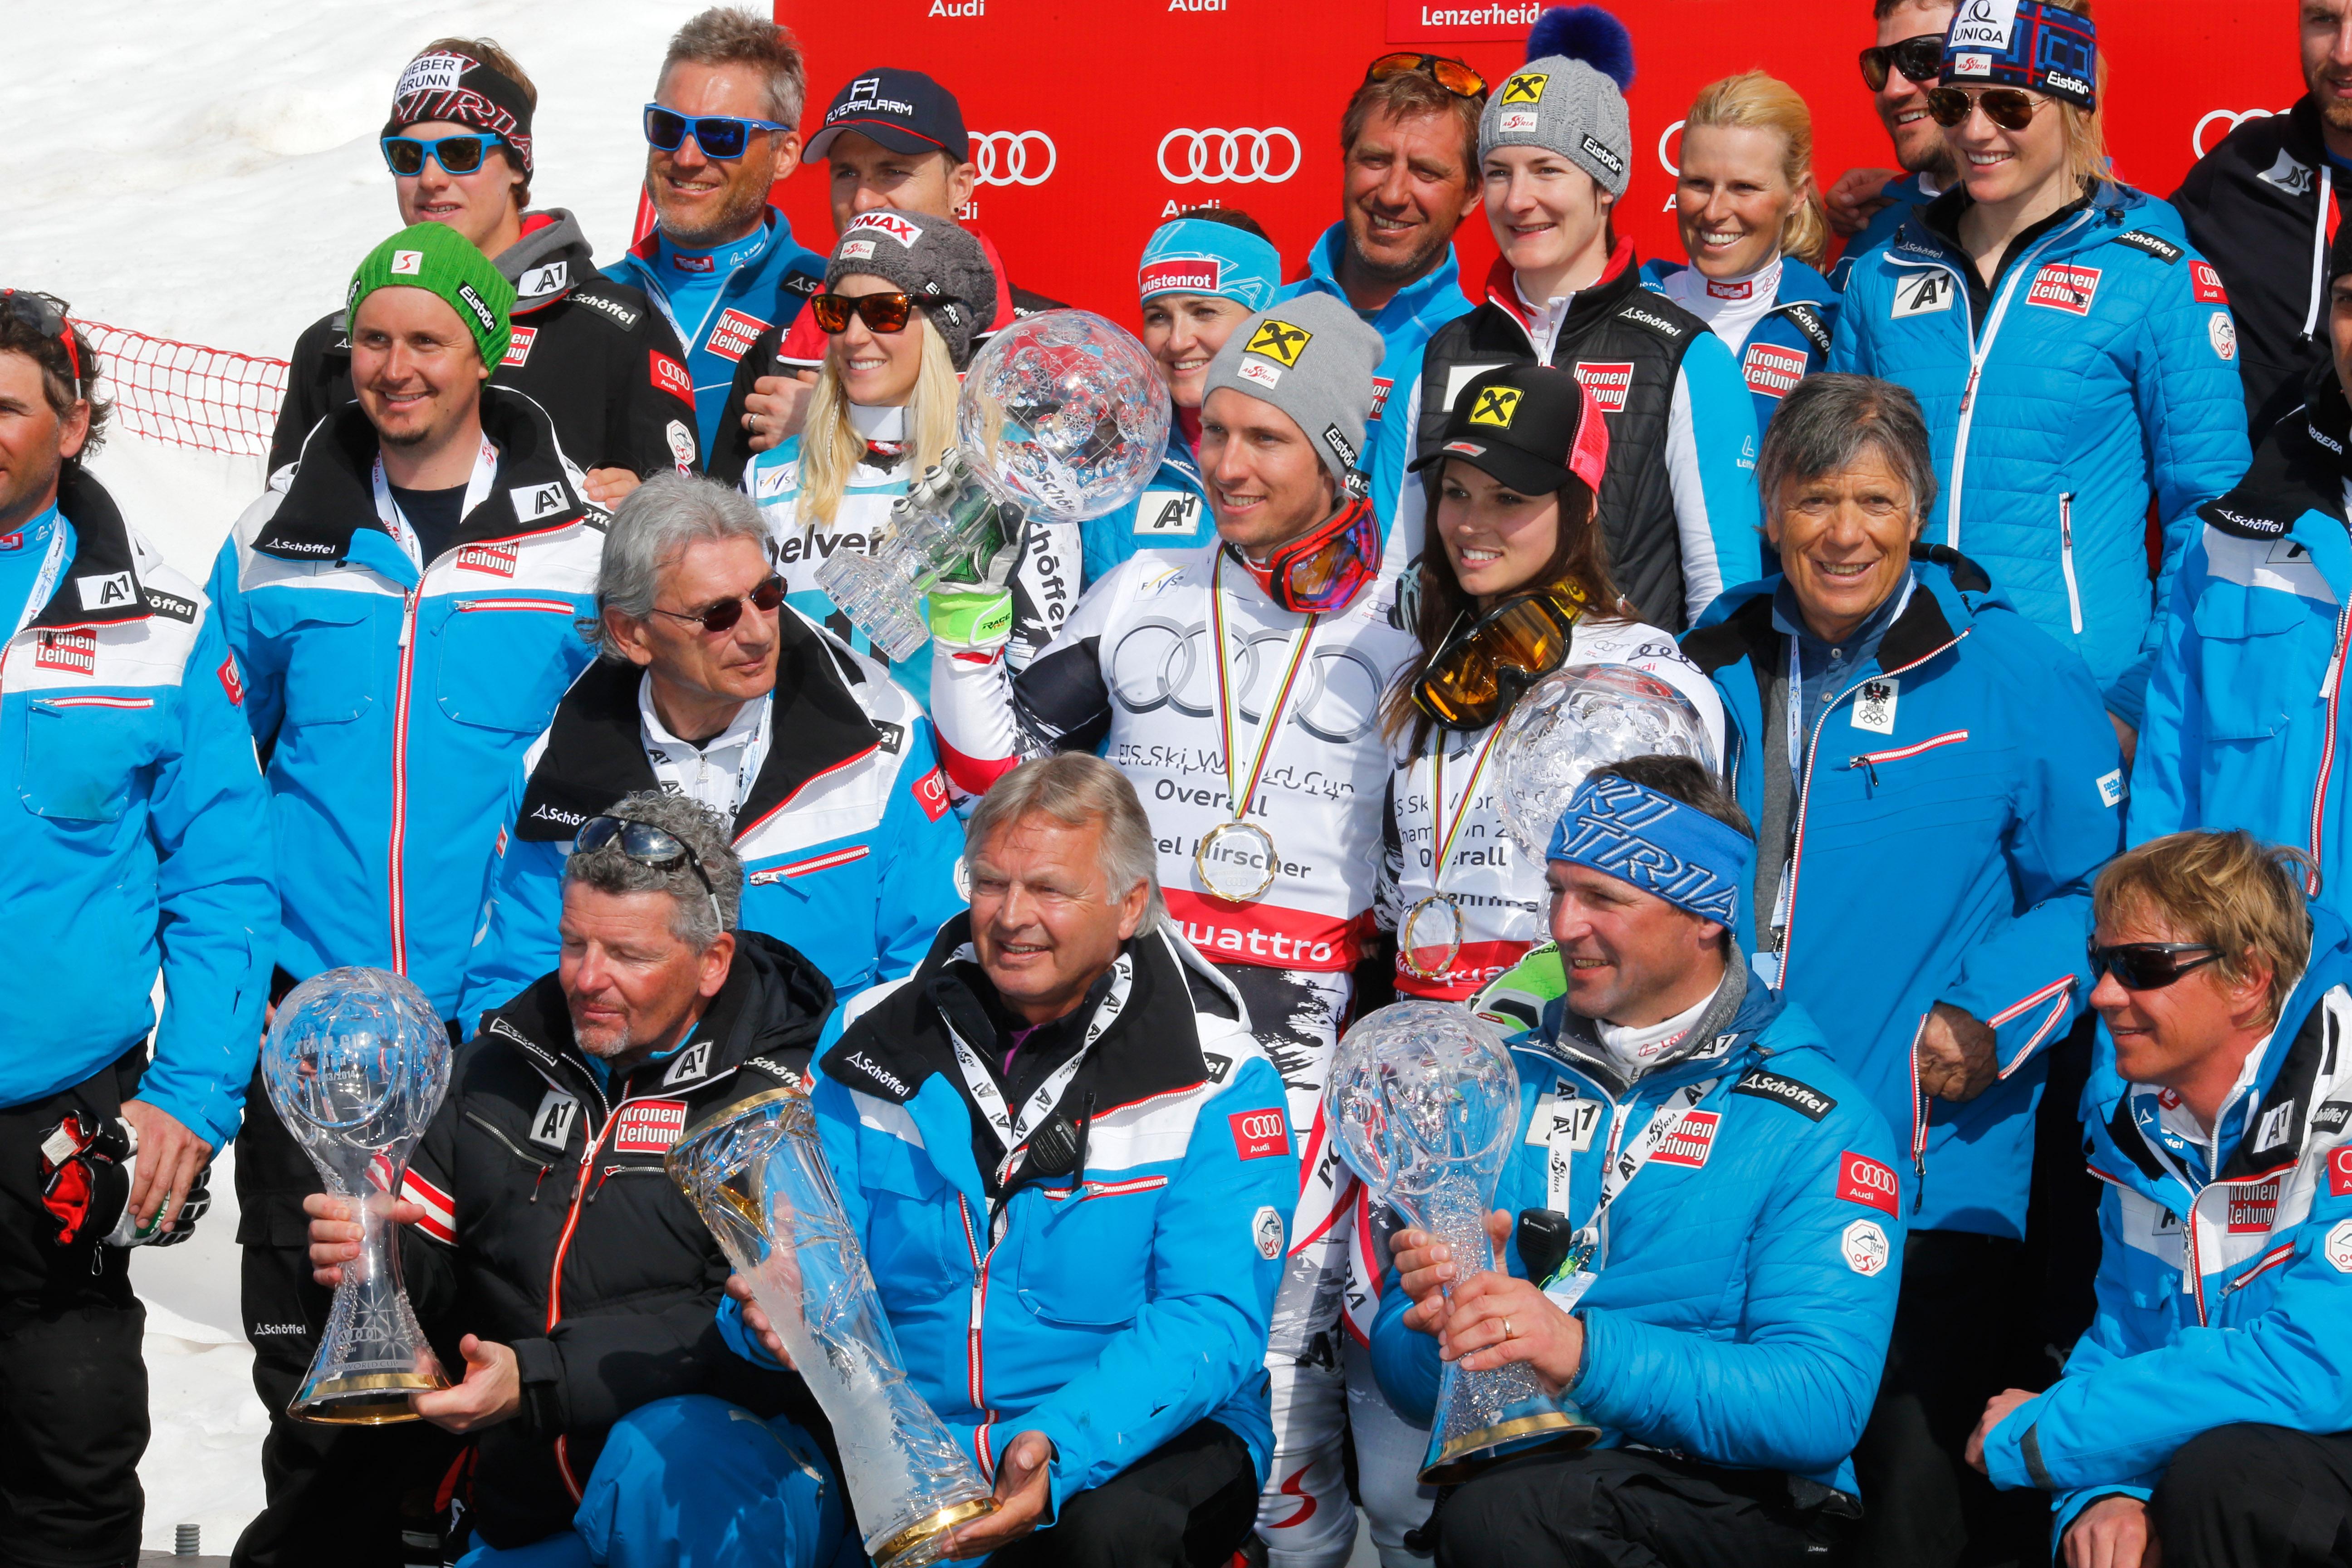 Austria names 20 alpine skiers to 2014-15 National Team ...